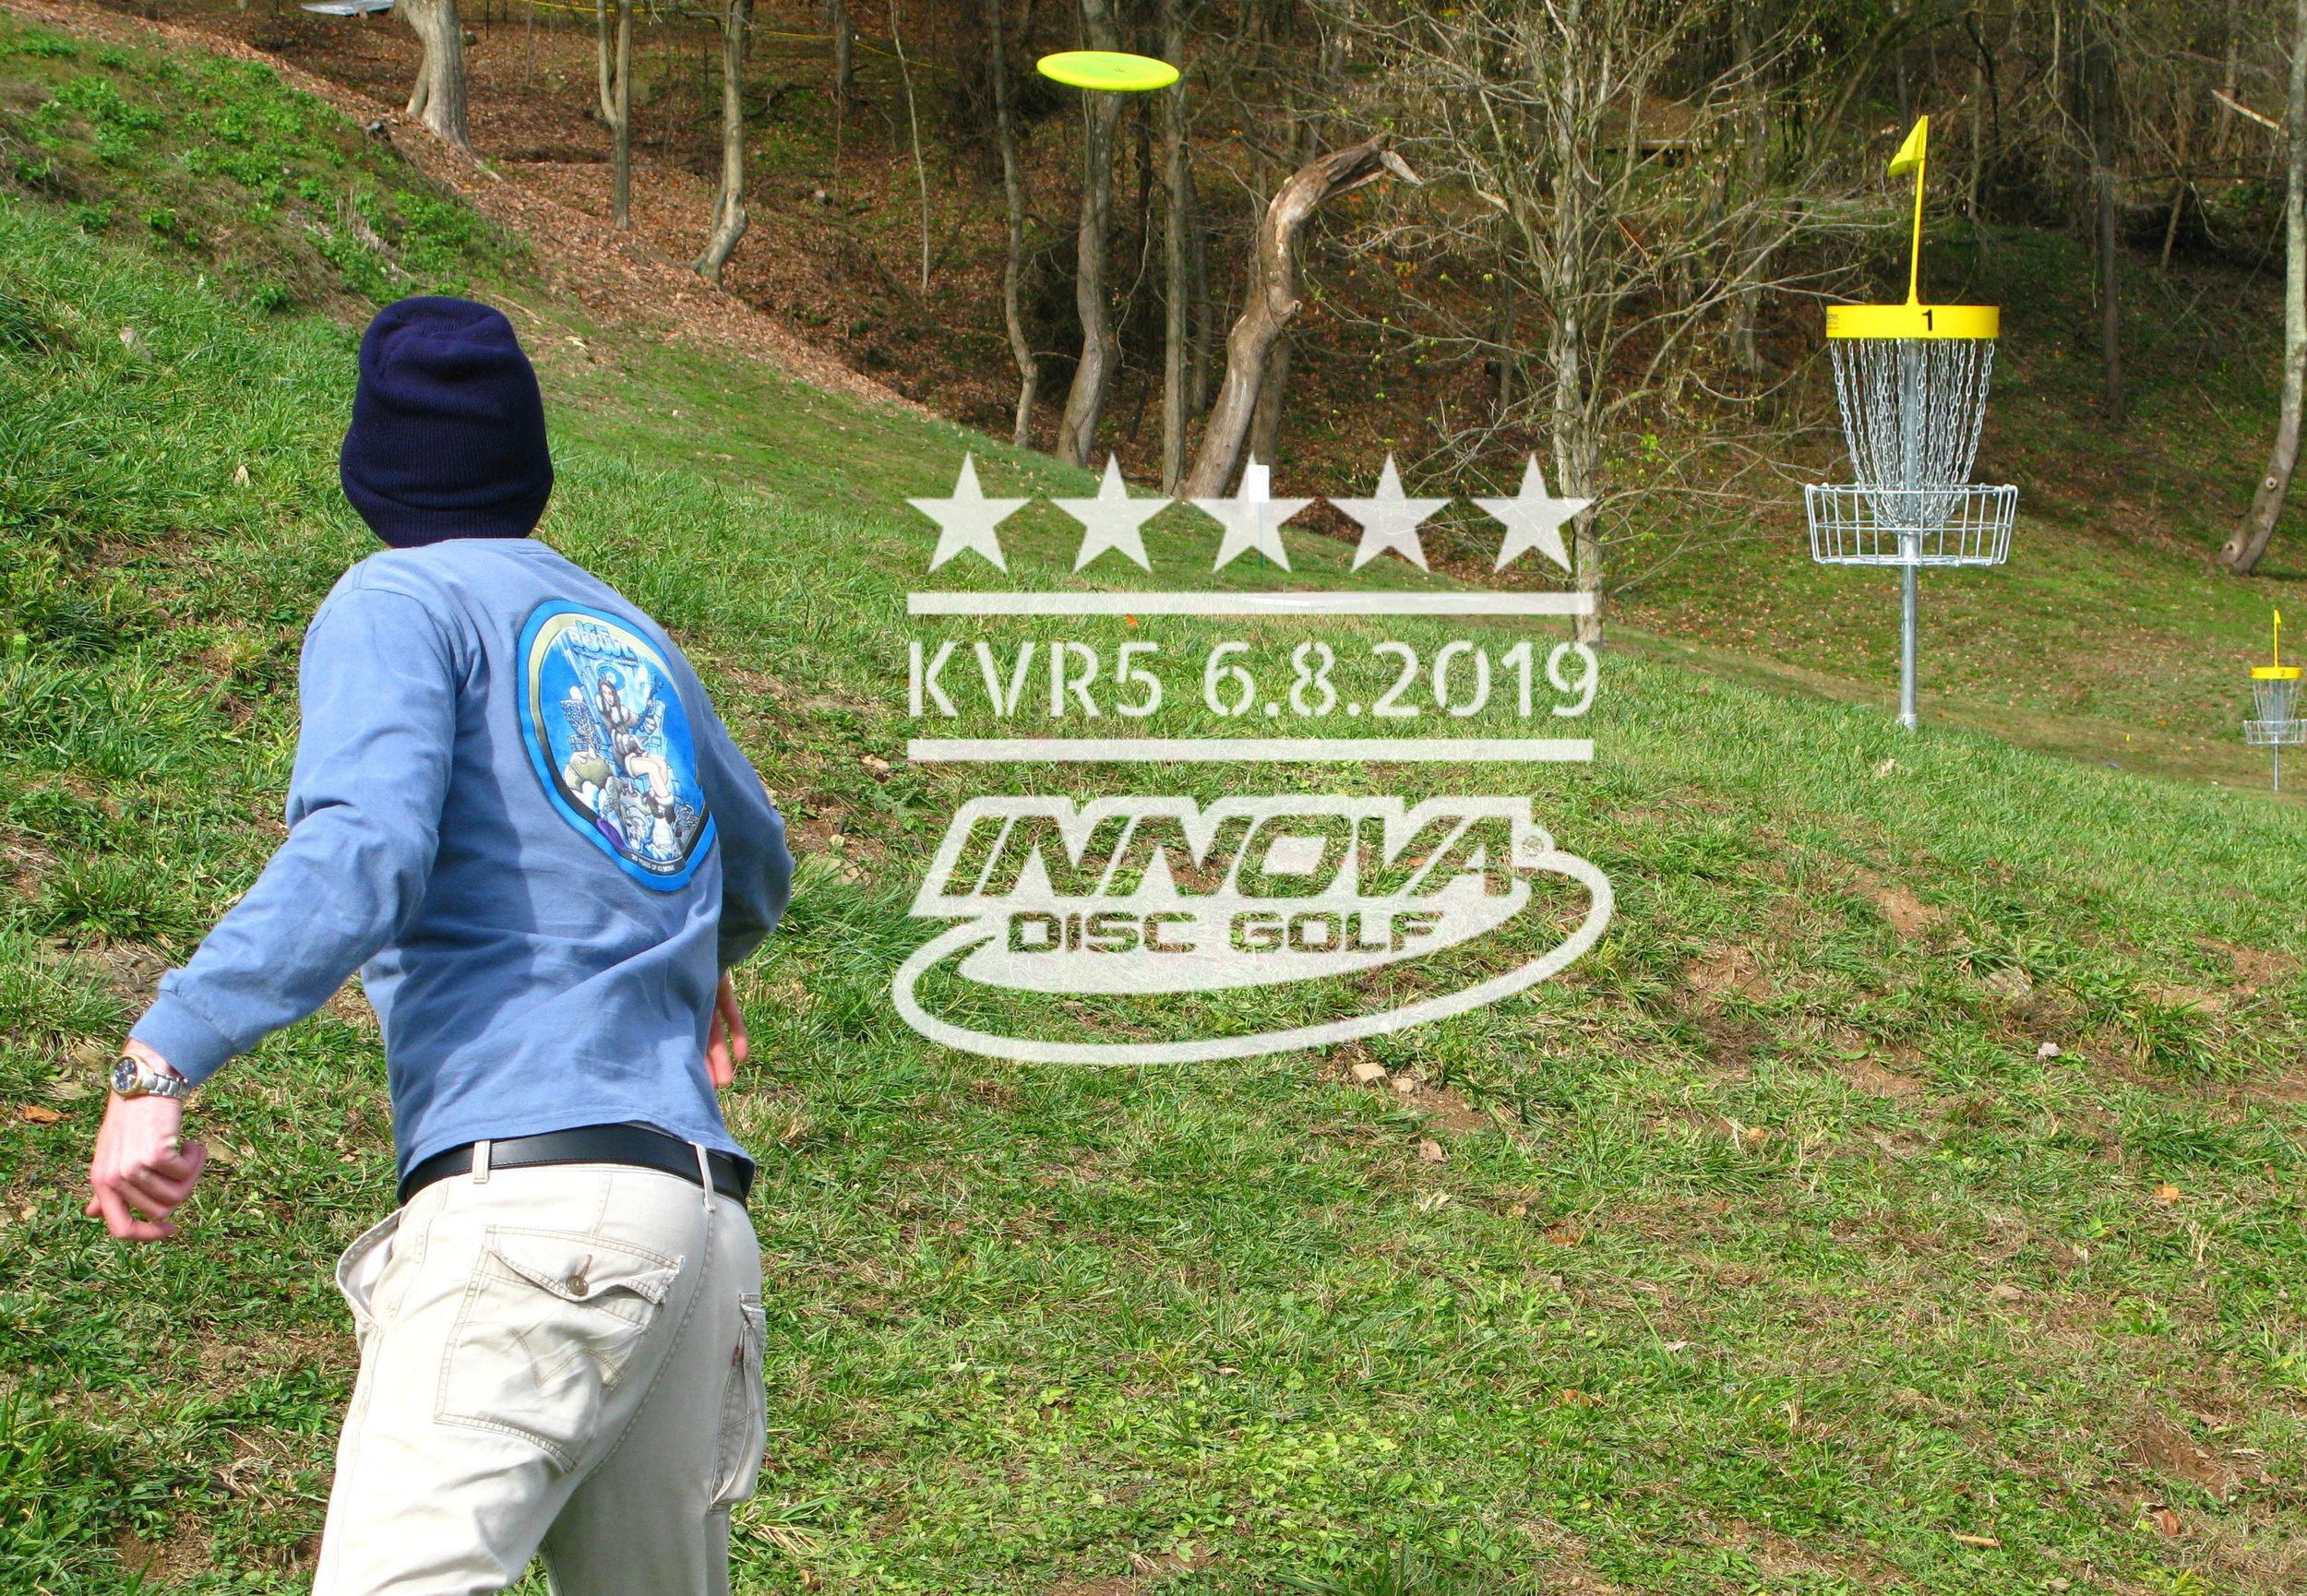 KVR5_2019_Disc-golf-tourney-photo-w-logo.jpg